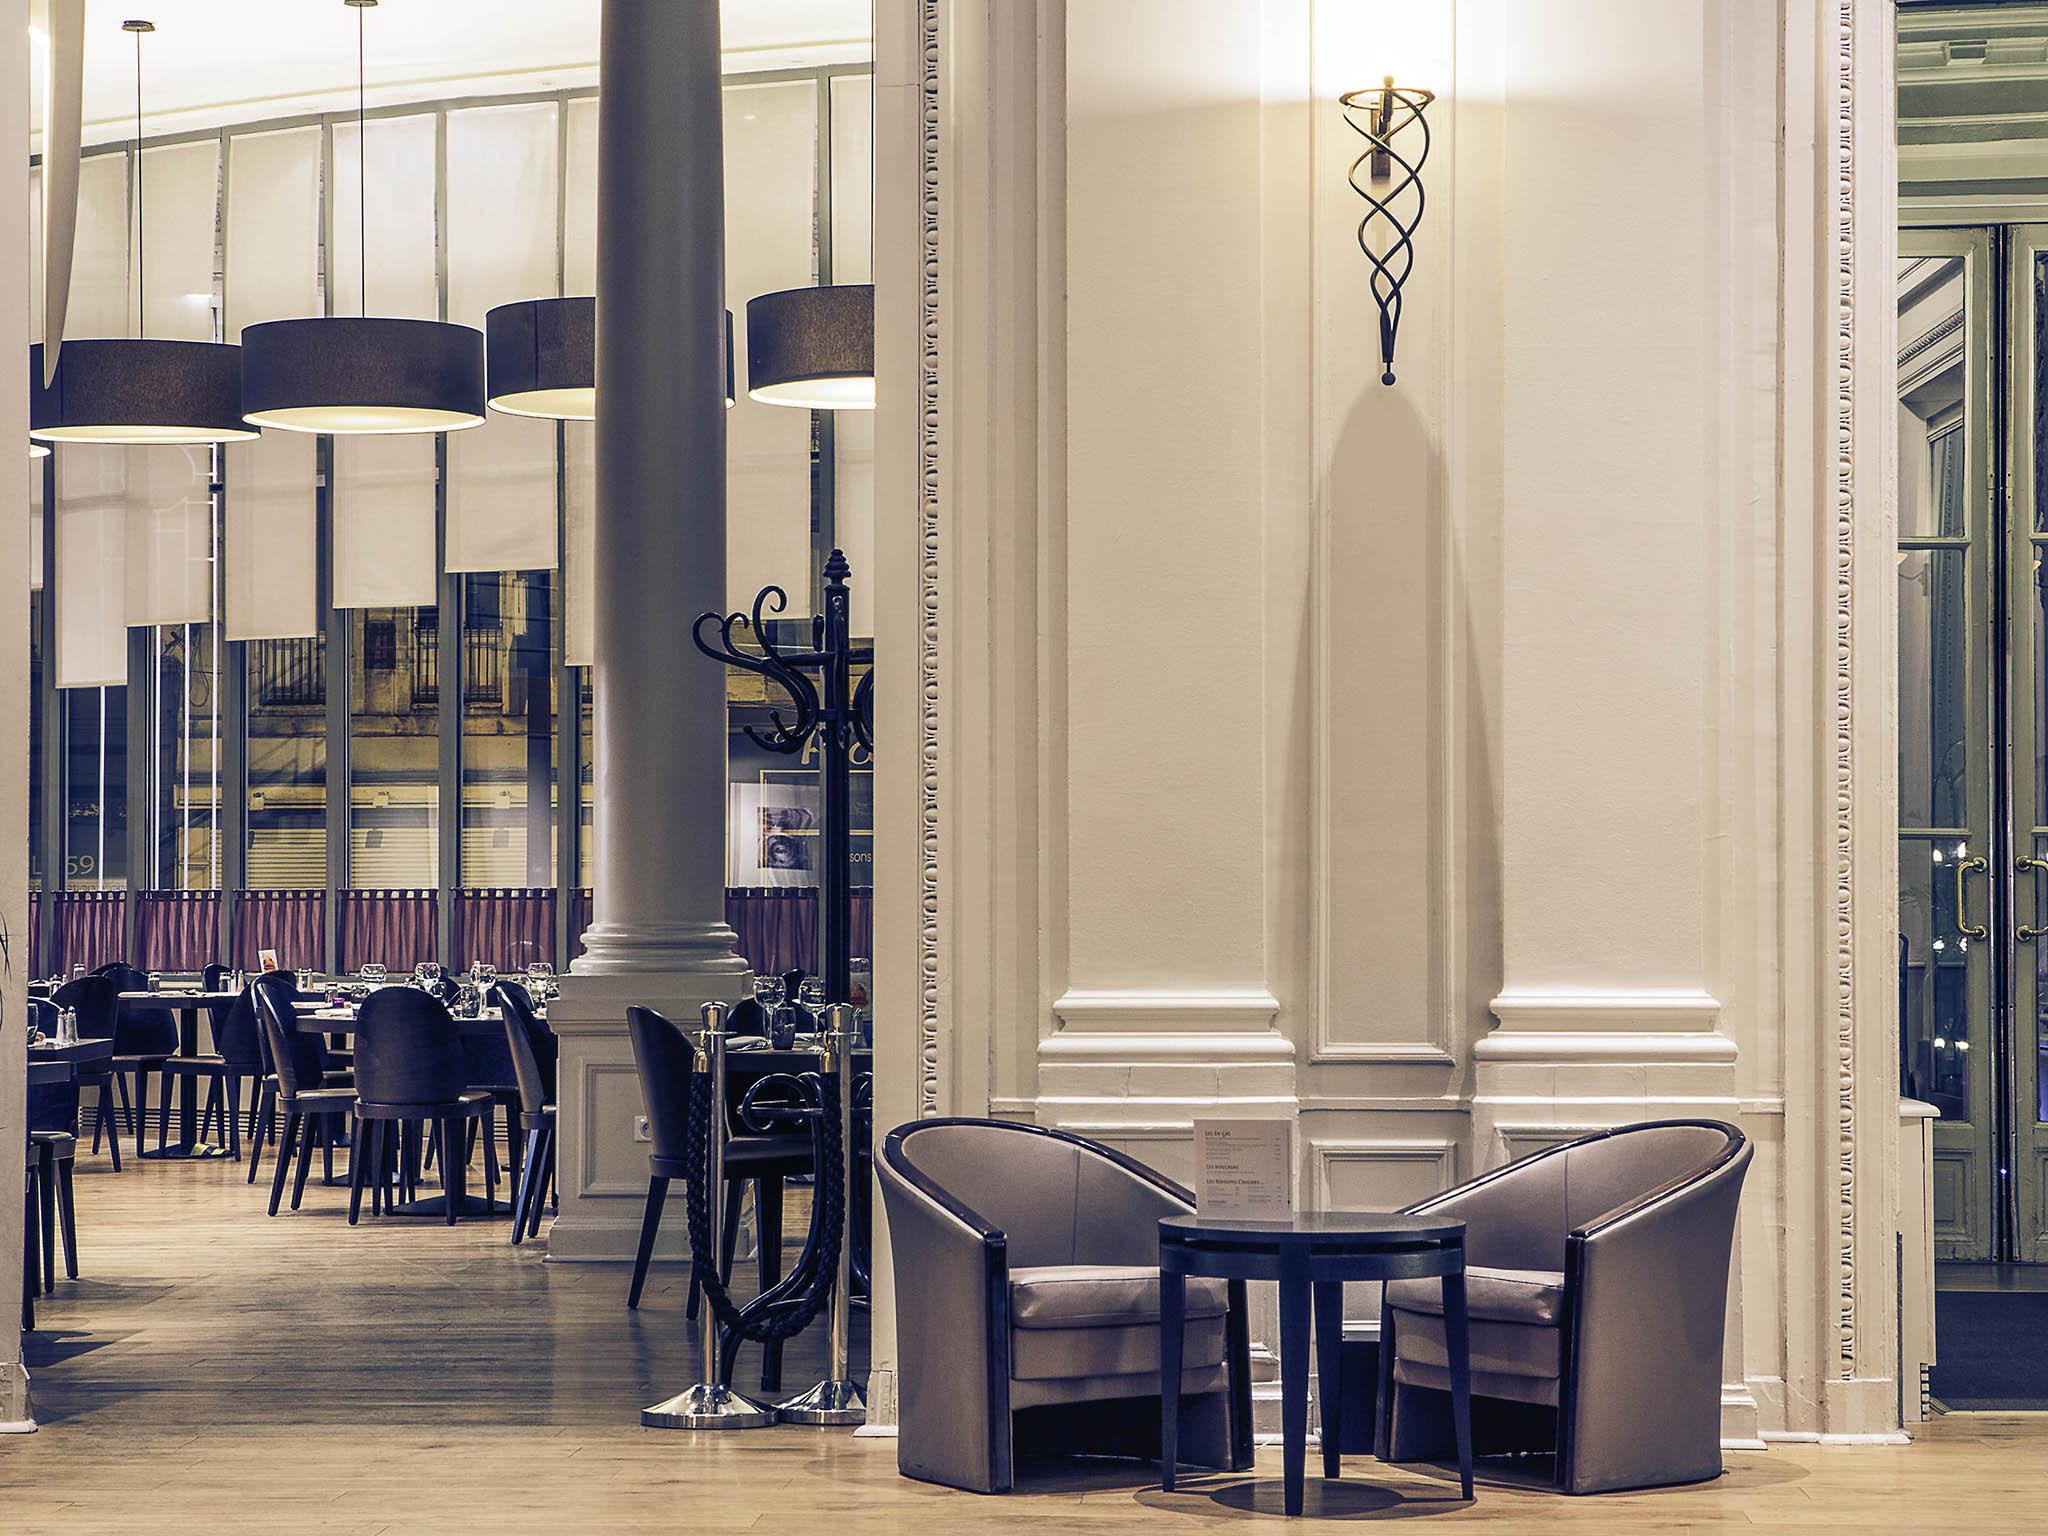 Hotel – Hotel Mercure Lille Roubaix Grand